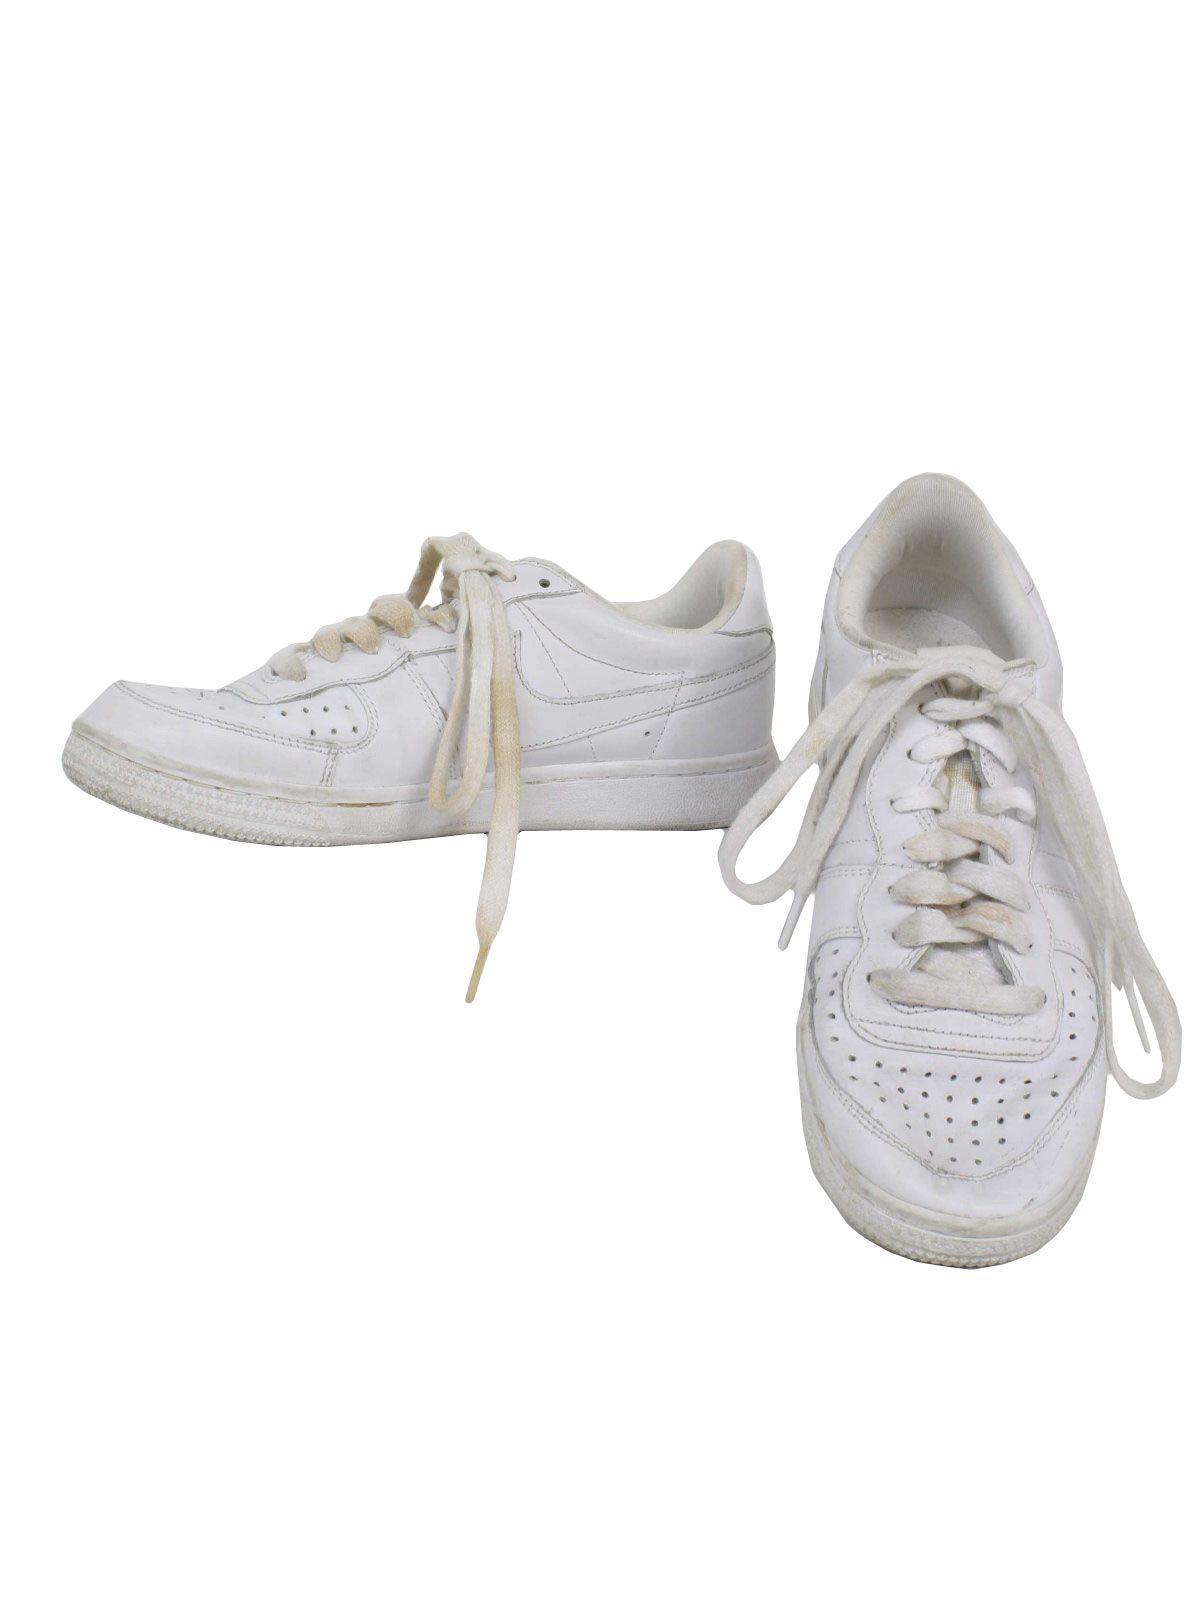 nike super lawn tennis shoes nike